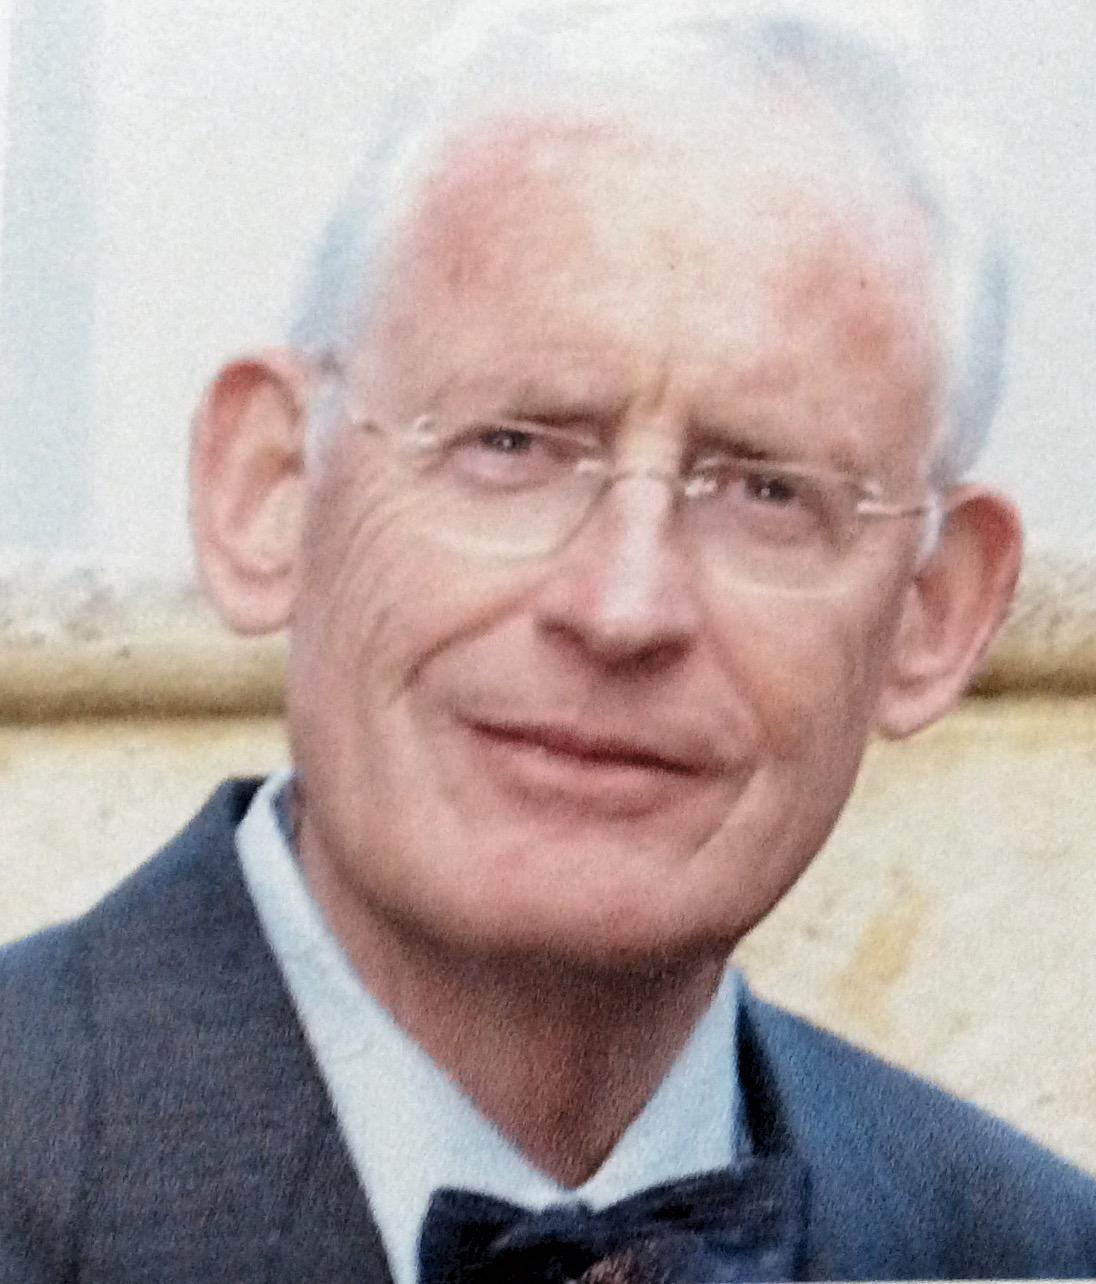 Dr David Barkhouse